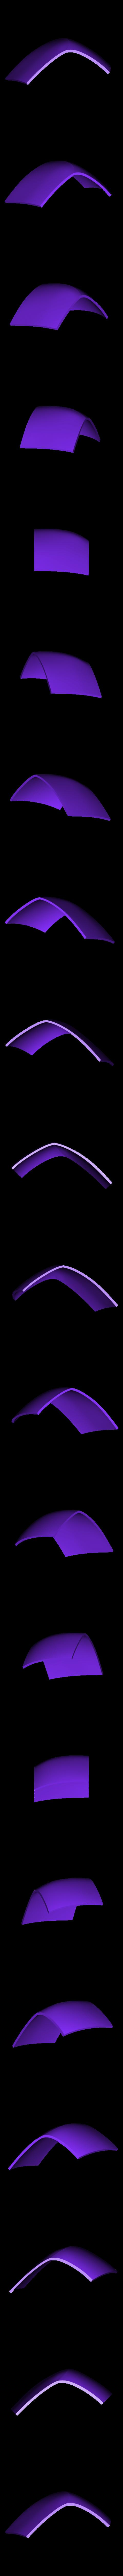 Part_6.stl Download free STL file Red Hood Helmet (Batman) • 3D printer object, VillainousPropShop